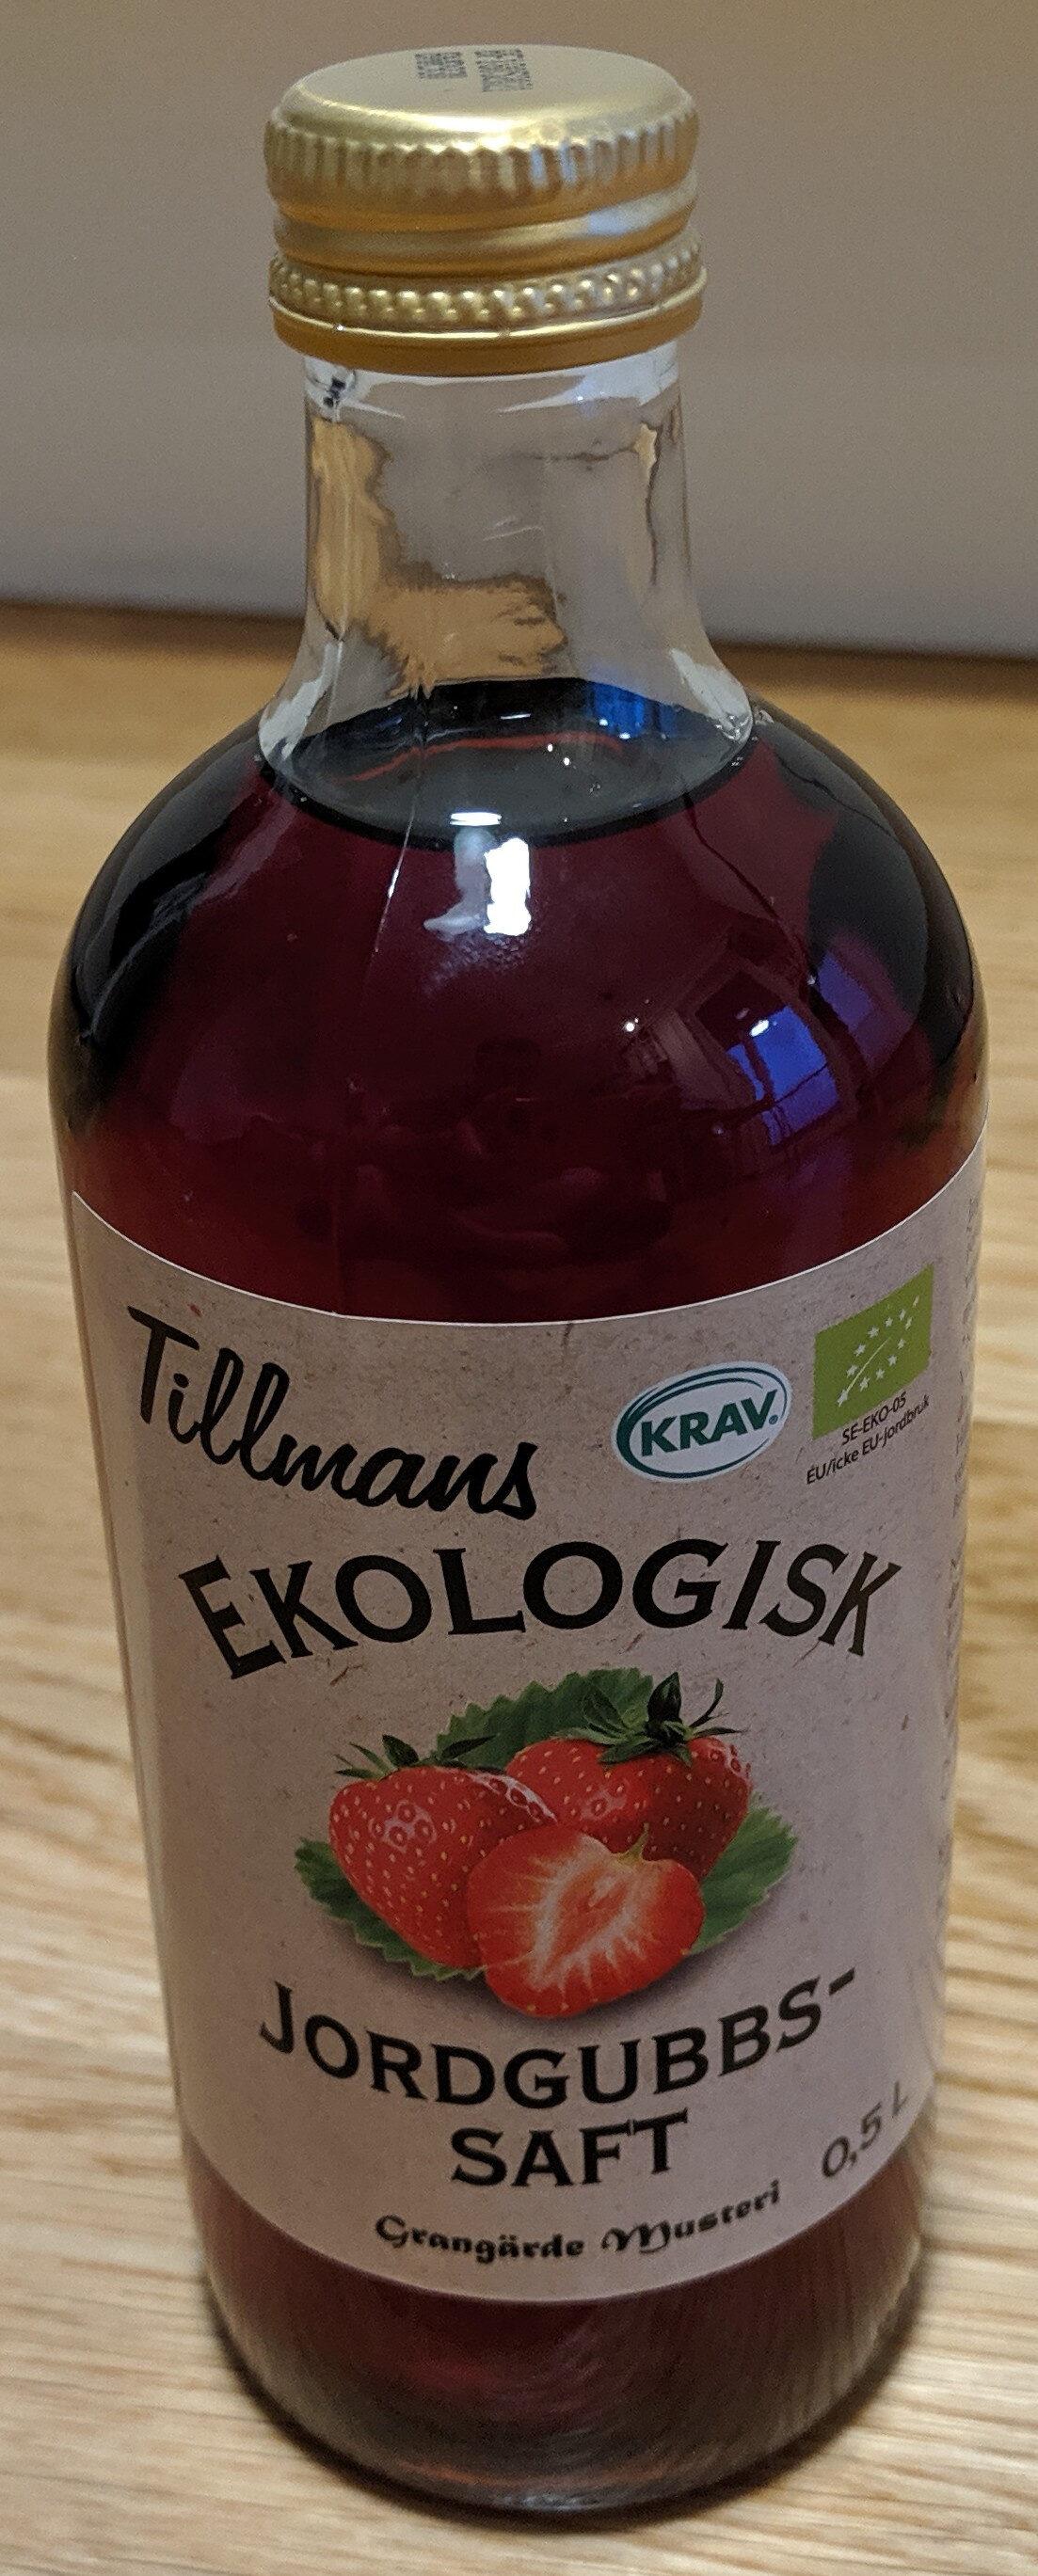 Tillmans Ekologisk Jordgubbs-saft - Produkt